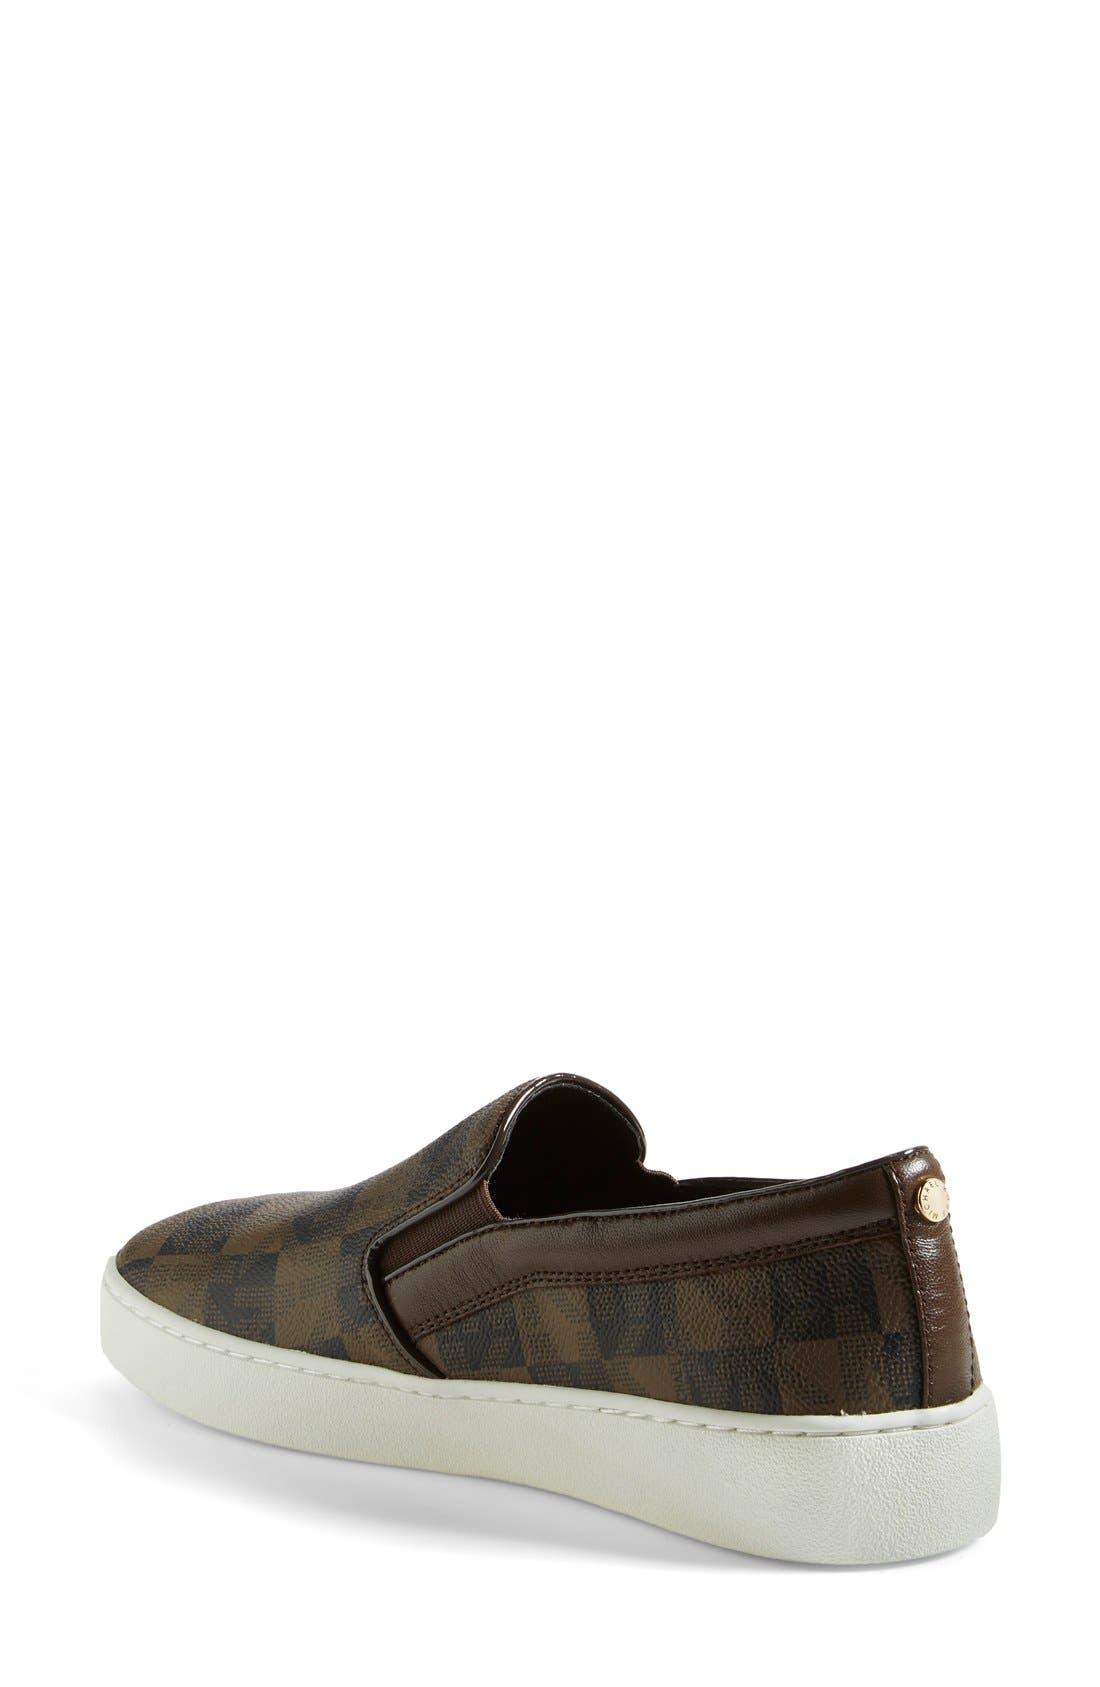 Keaton Slip-On Sneaker,                             Alternate thumbnail 106, color,